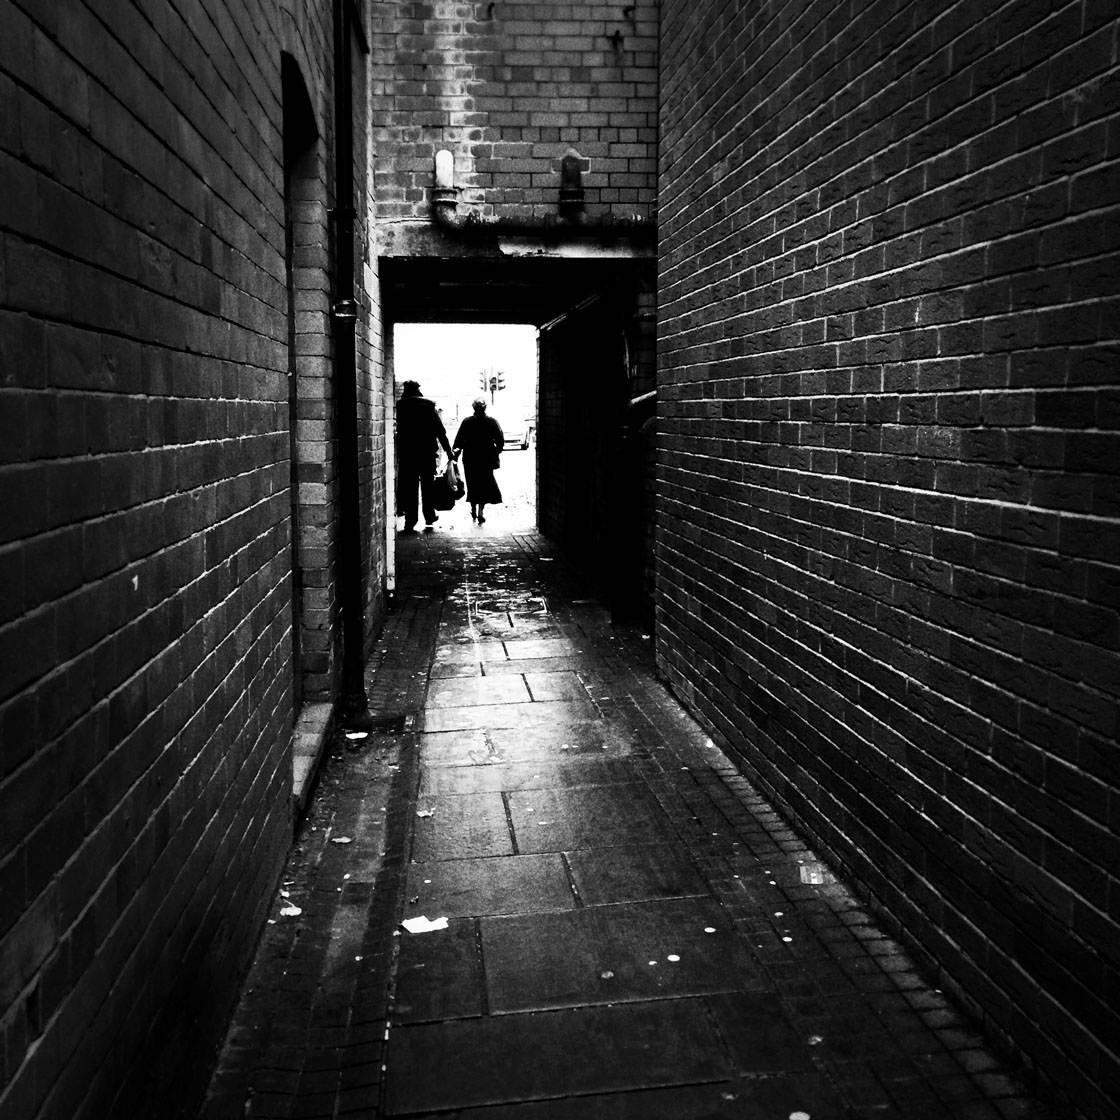 Ordinary iPhone Photo Subjects 44 no script